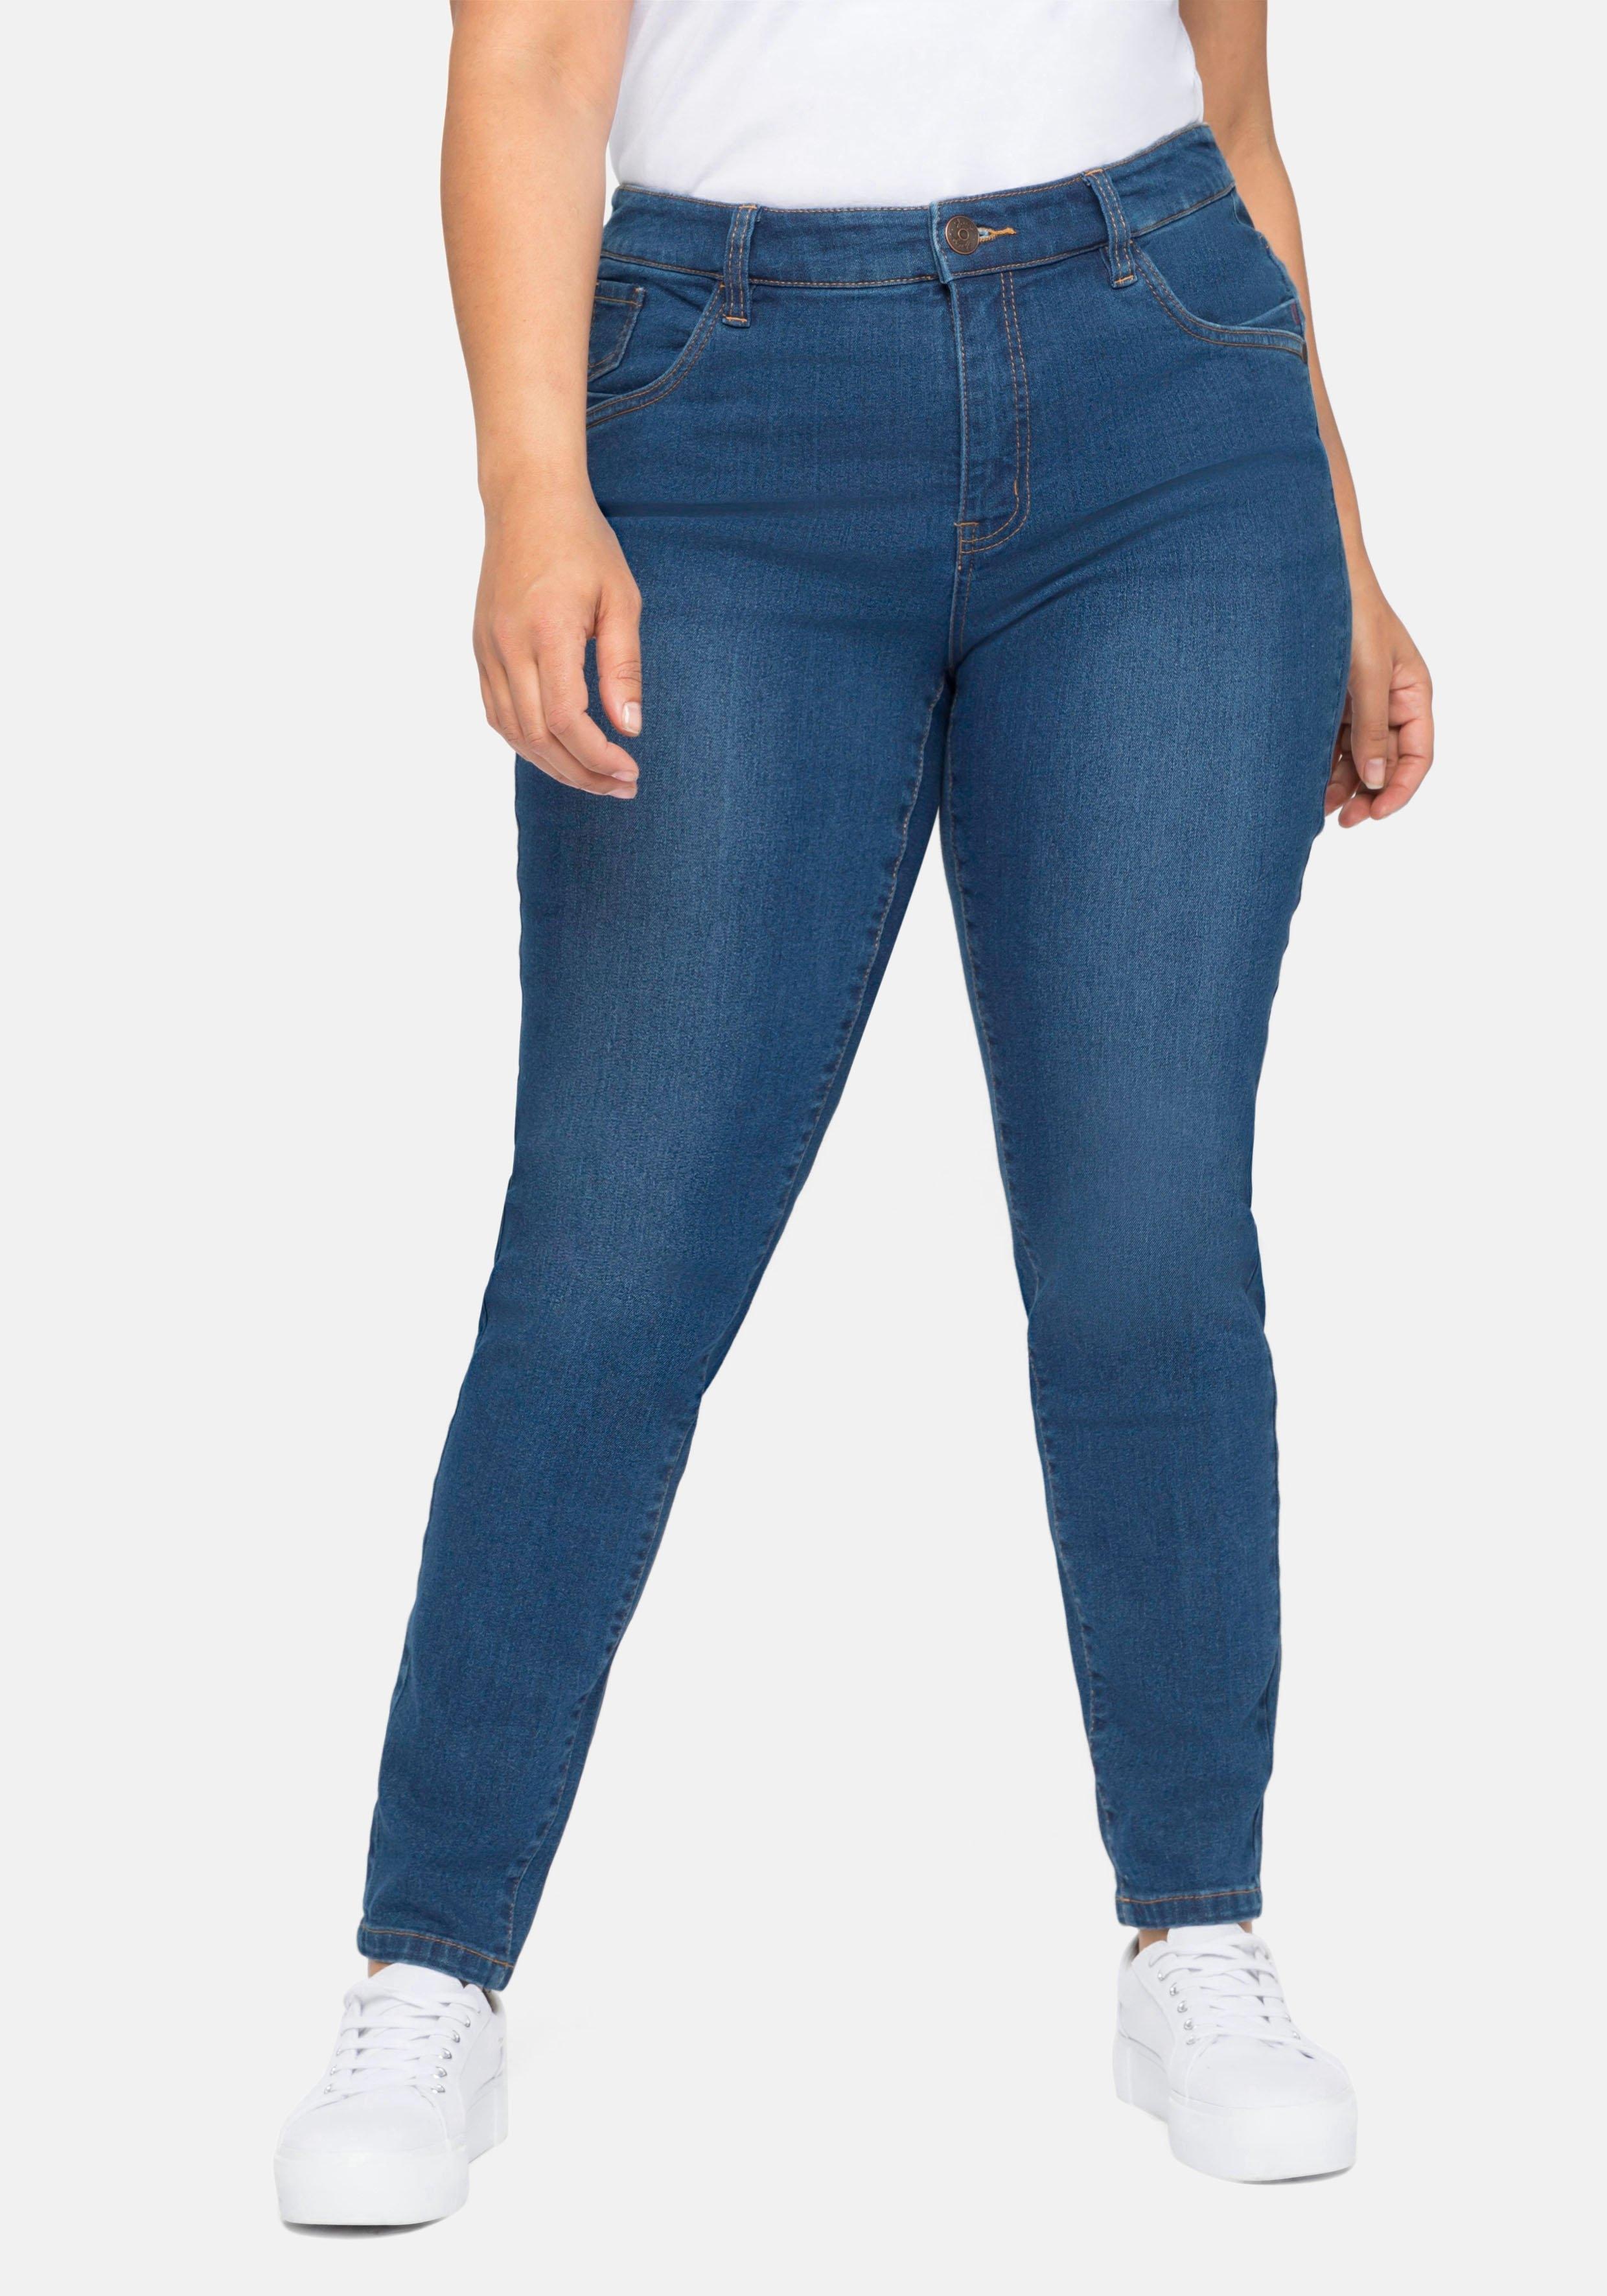 Sheego stretch jeans Skinny in 5-pocketsmodel - verschillende betaalmethodes